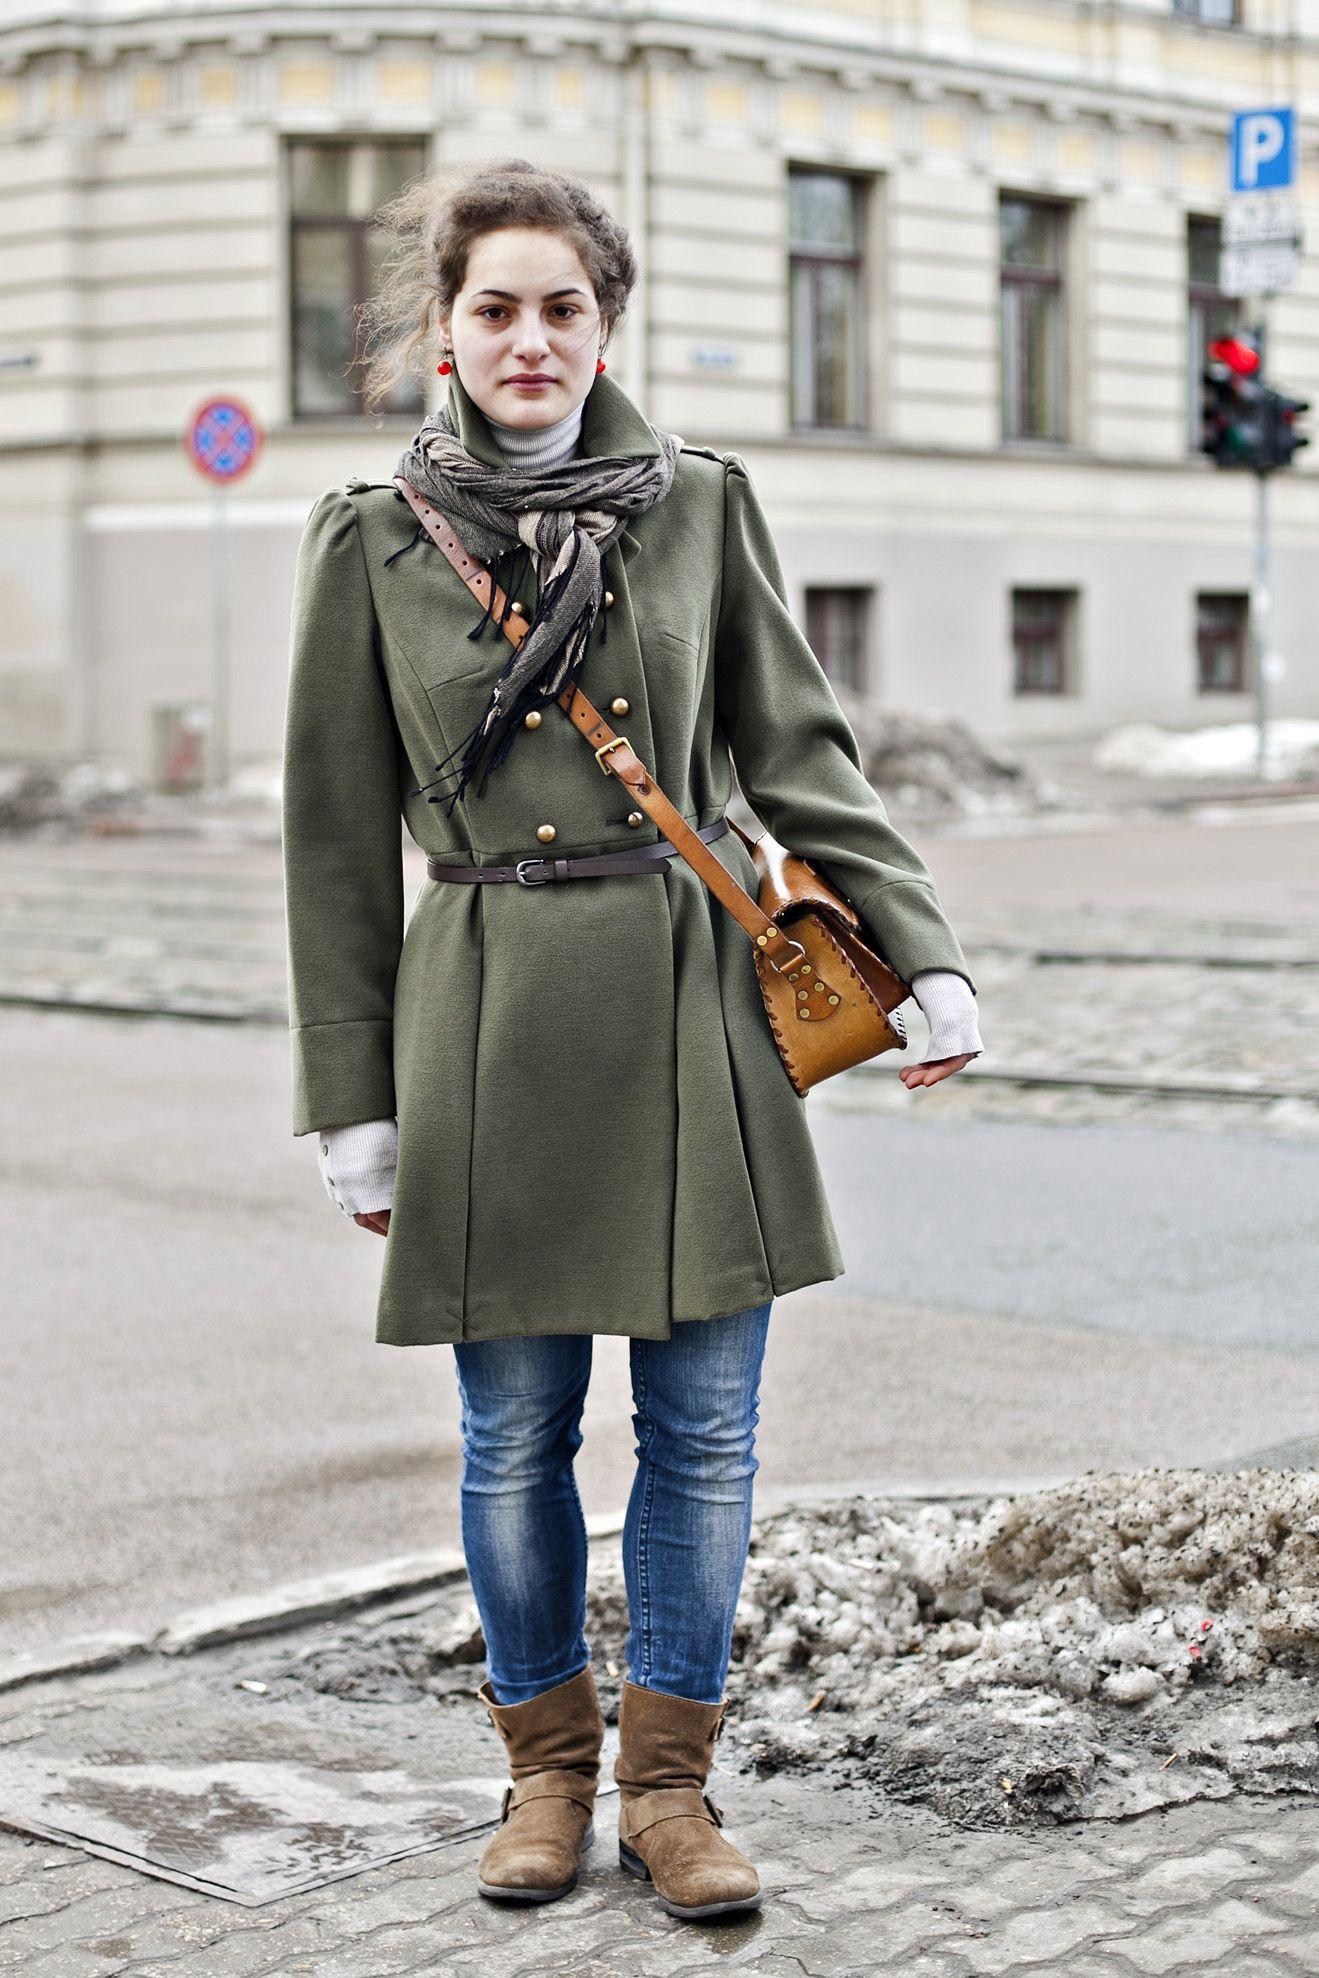 Fashion in the streets of Riga. Stasija.